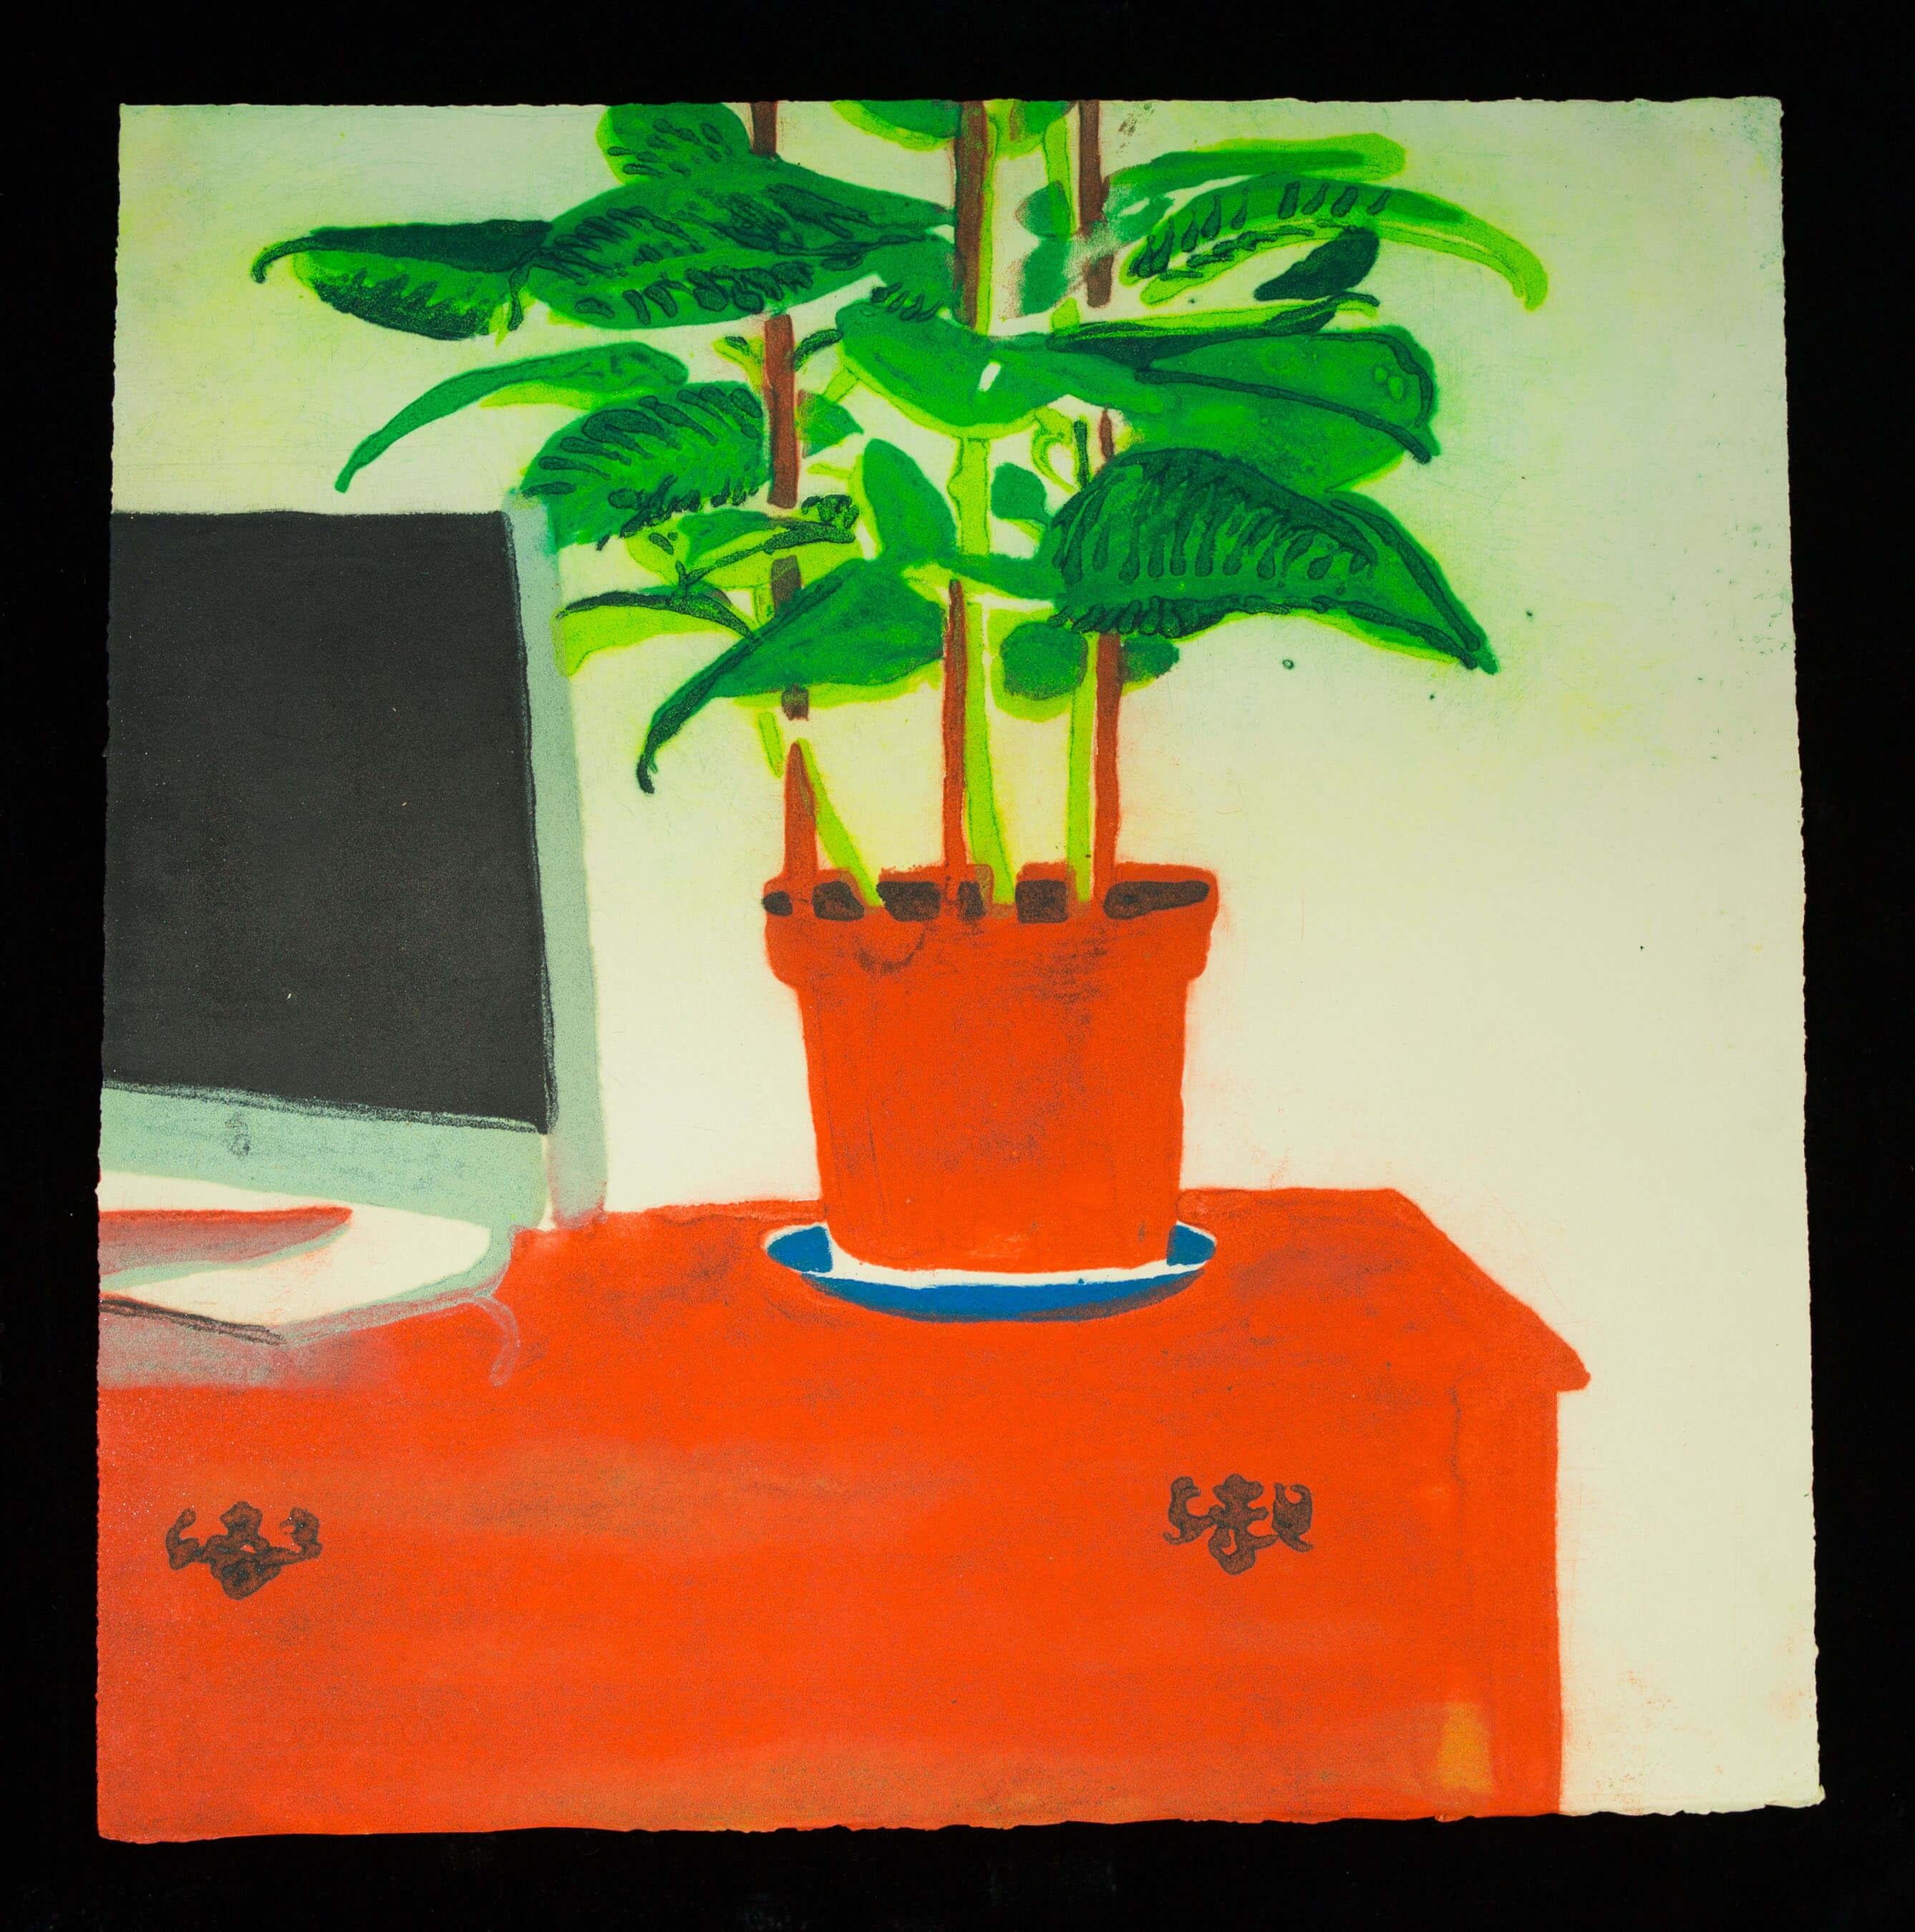 House Plant III, 2015